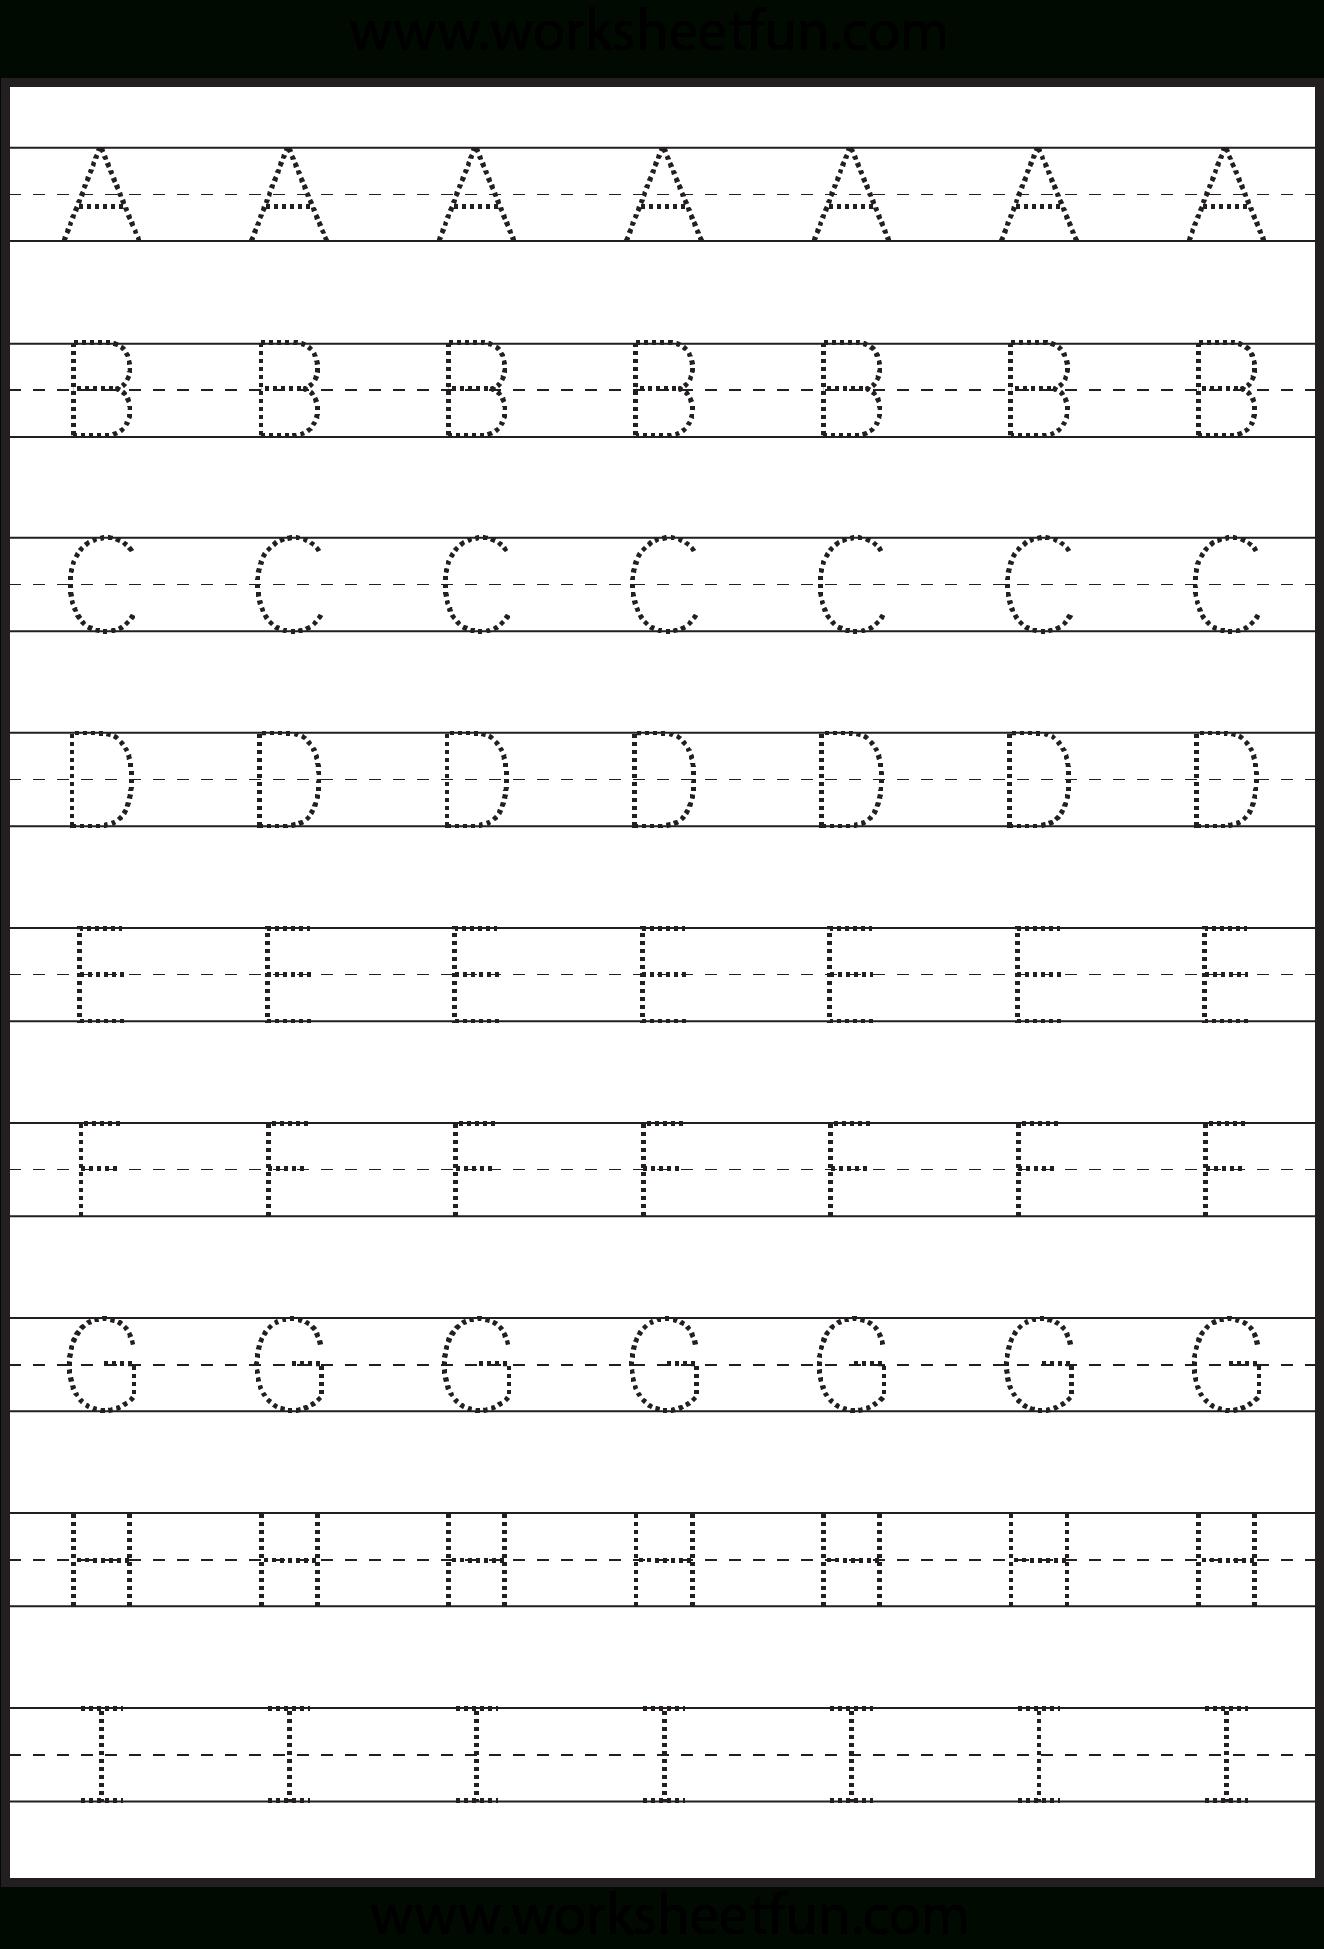 Math Worksheet : Pinterest Login Free Tracing Worksheets For